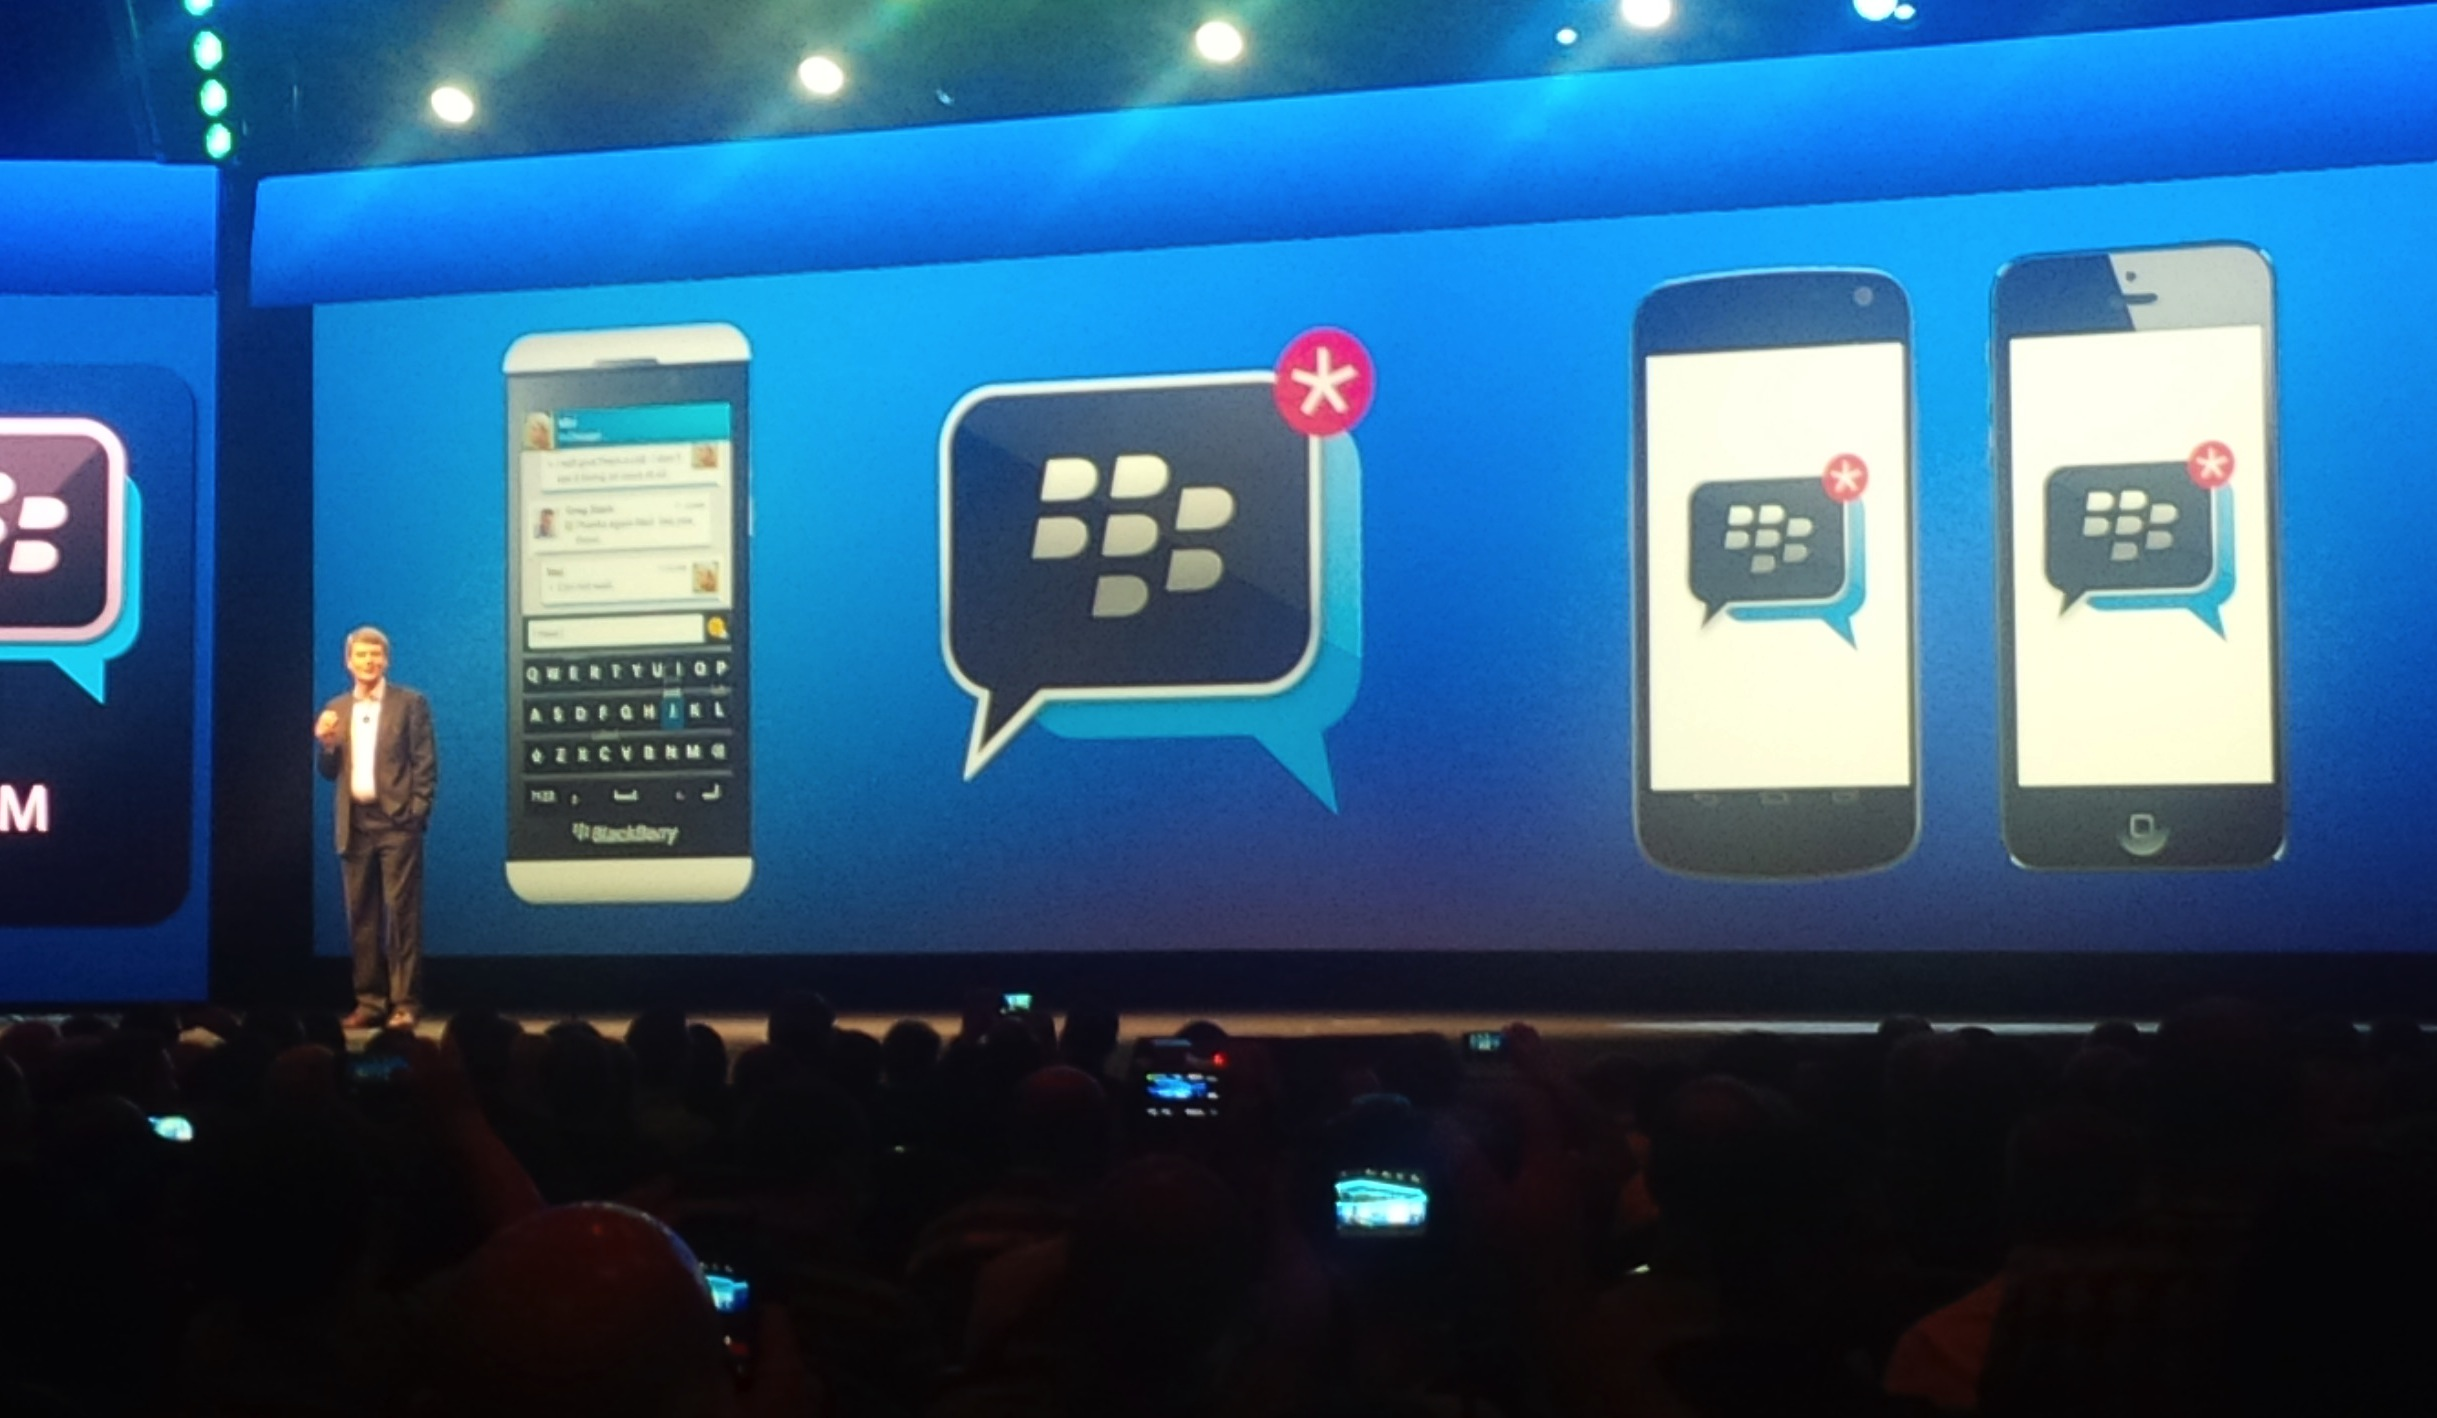 bbm-cross-platform.jpg